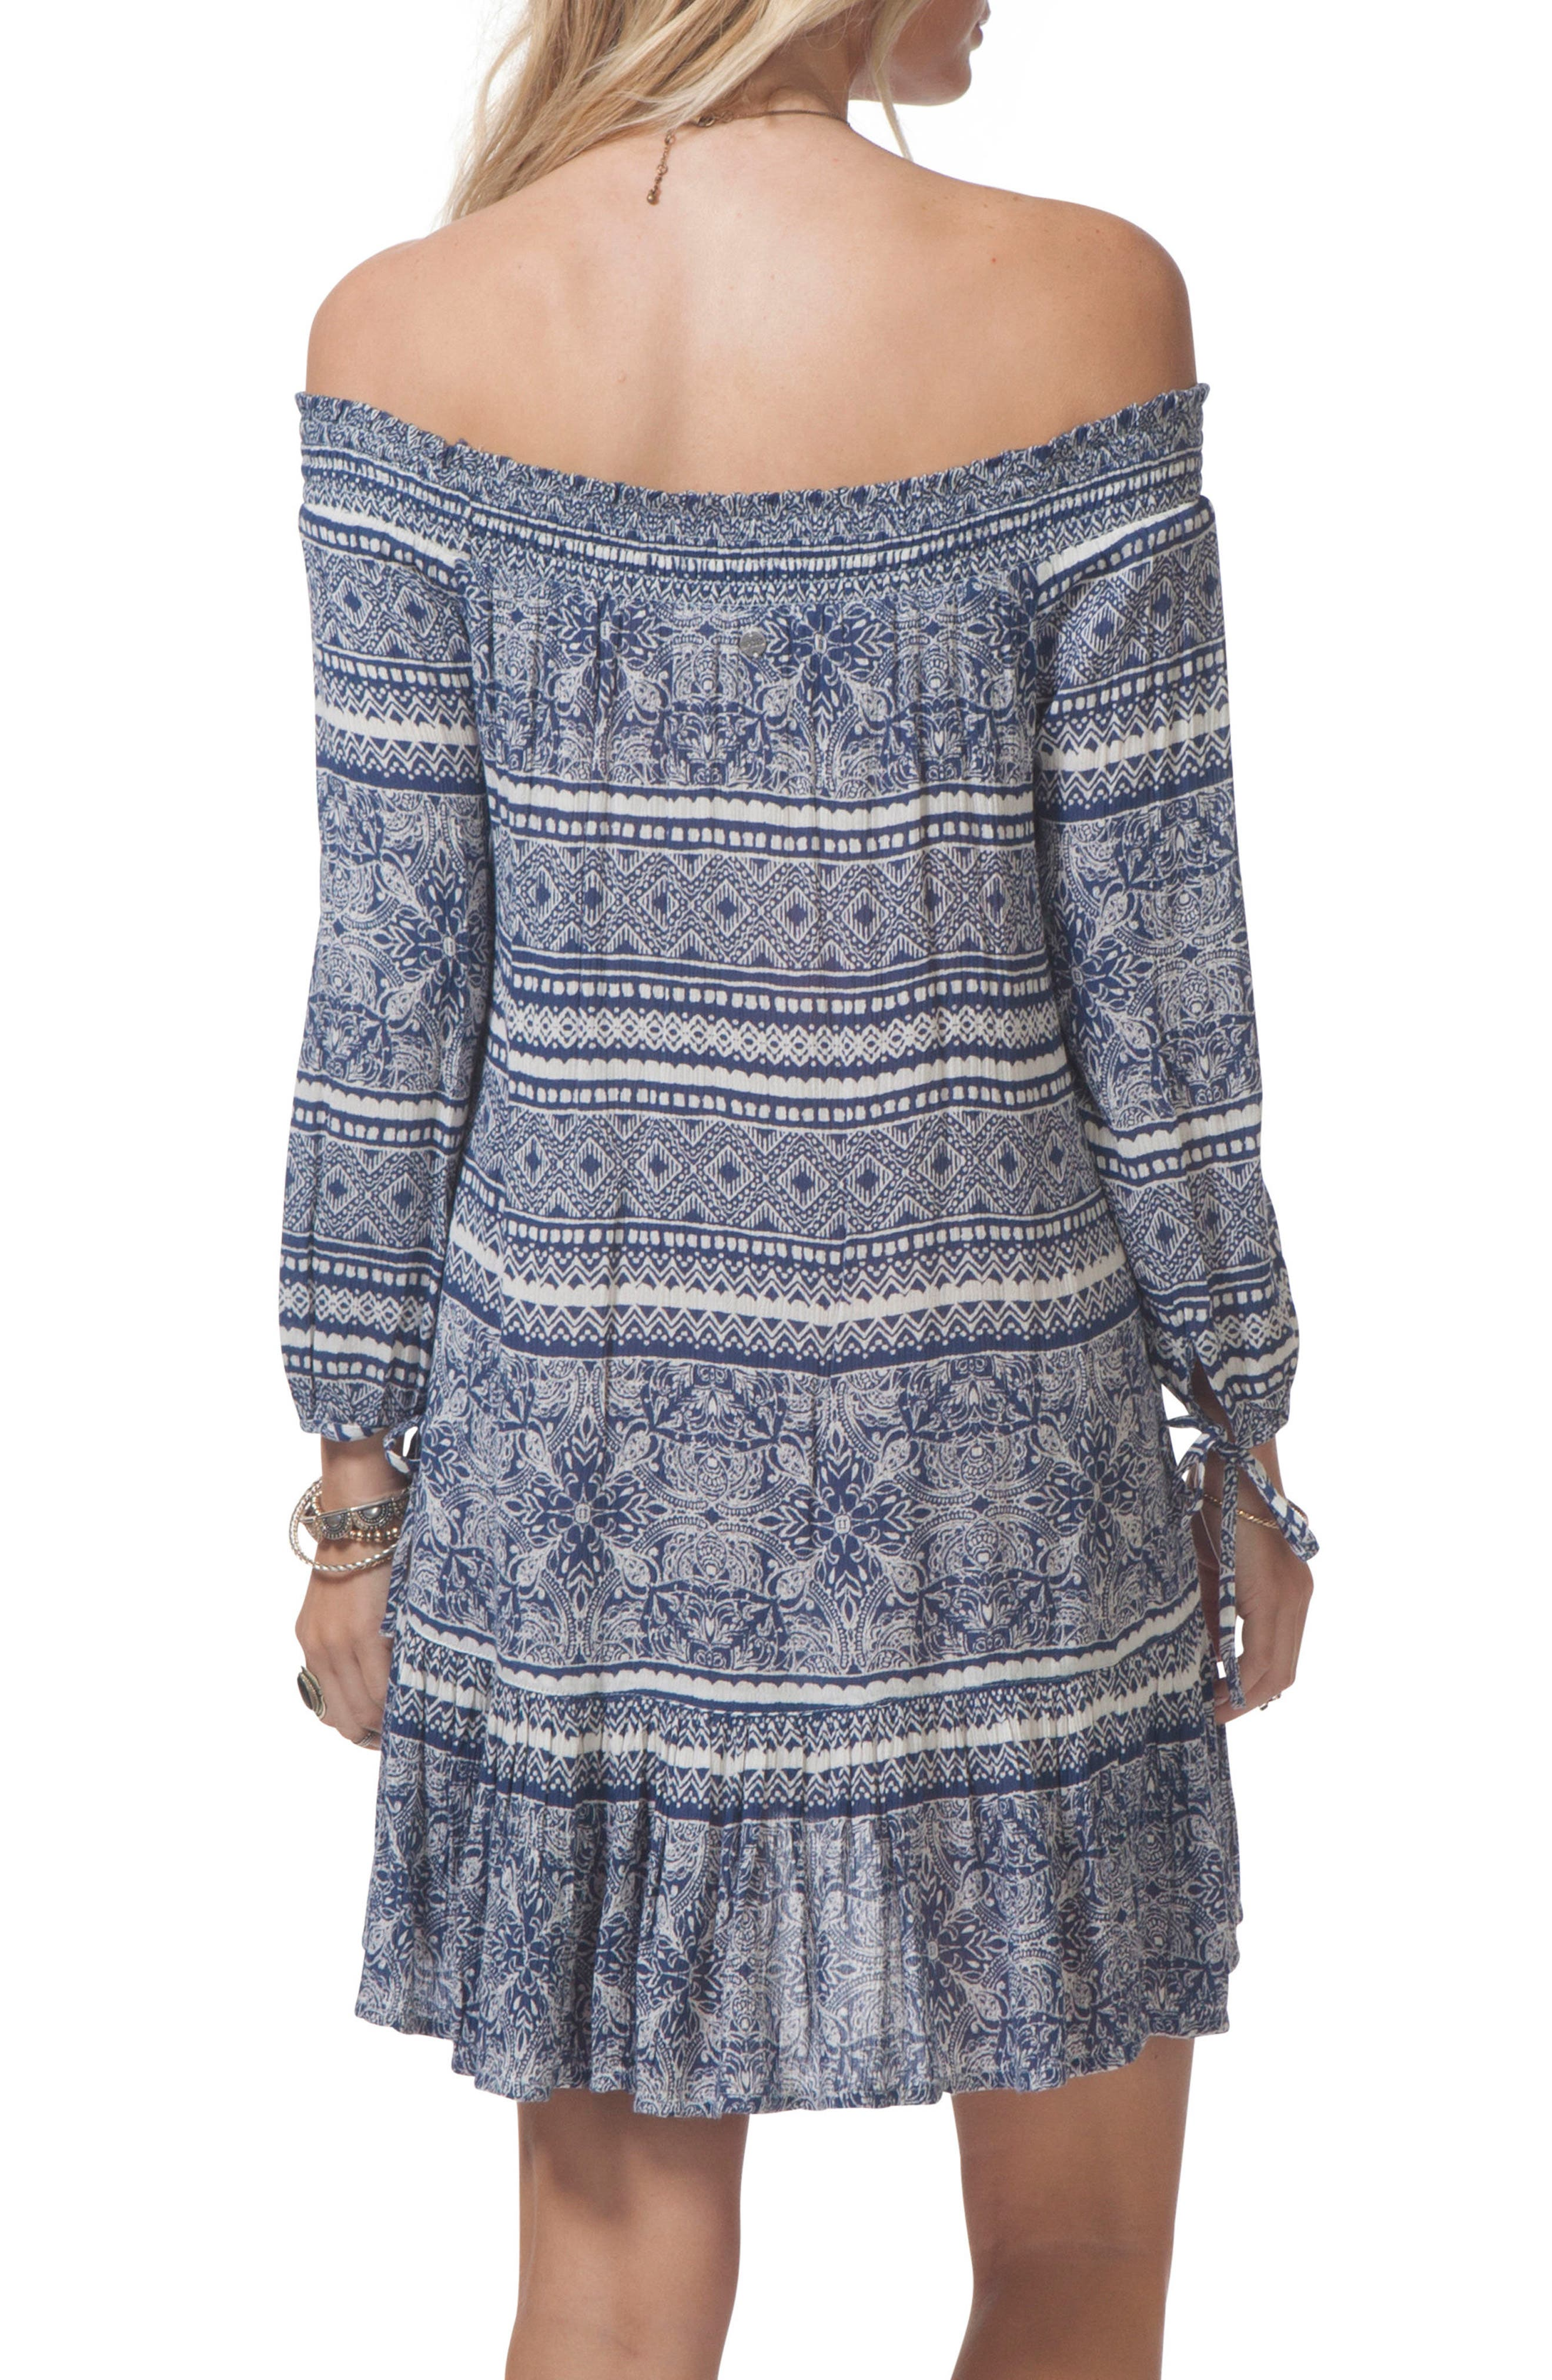 Southeast Off the Shoulder Dress,                             Alternate thumbnail 2, color,                             410